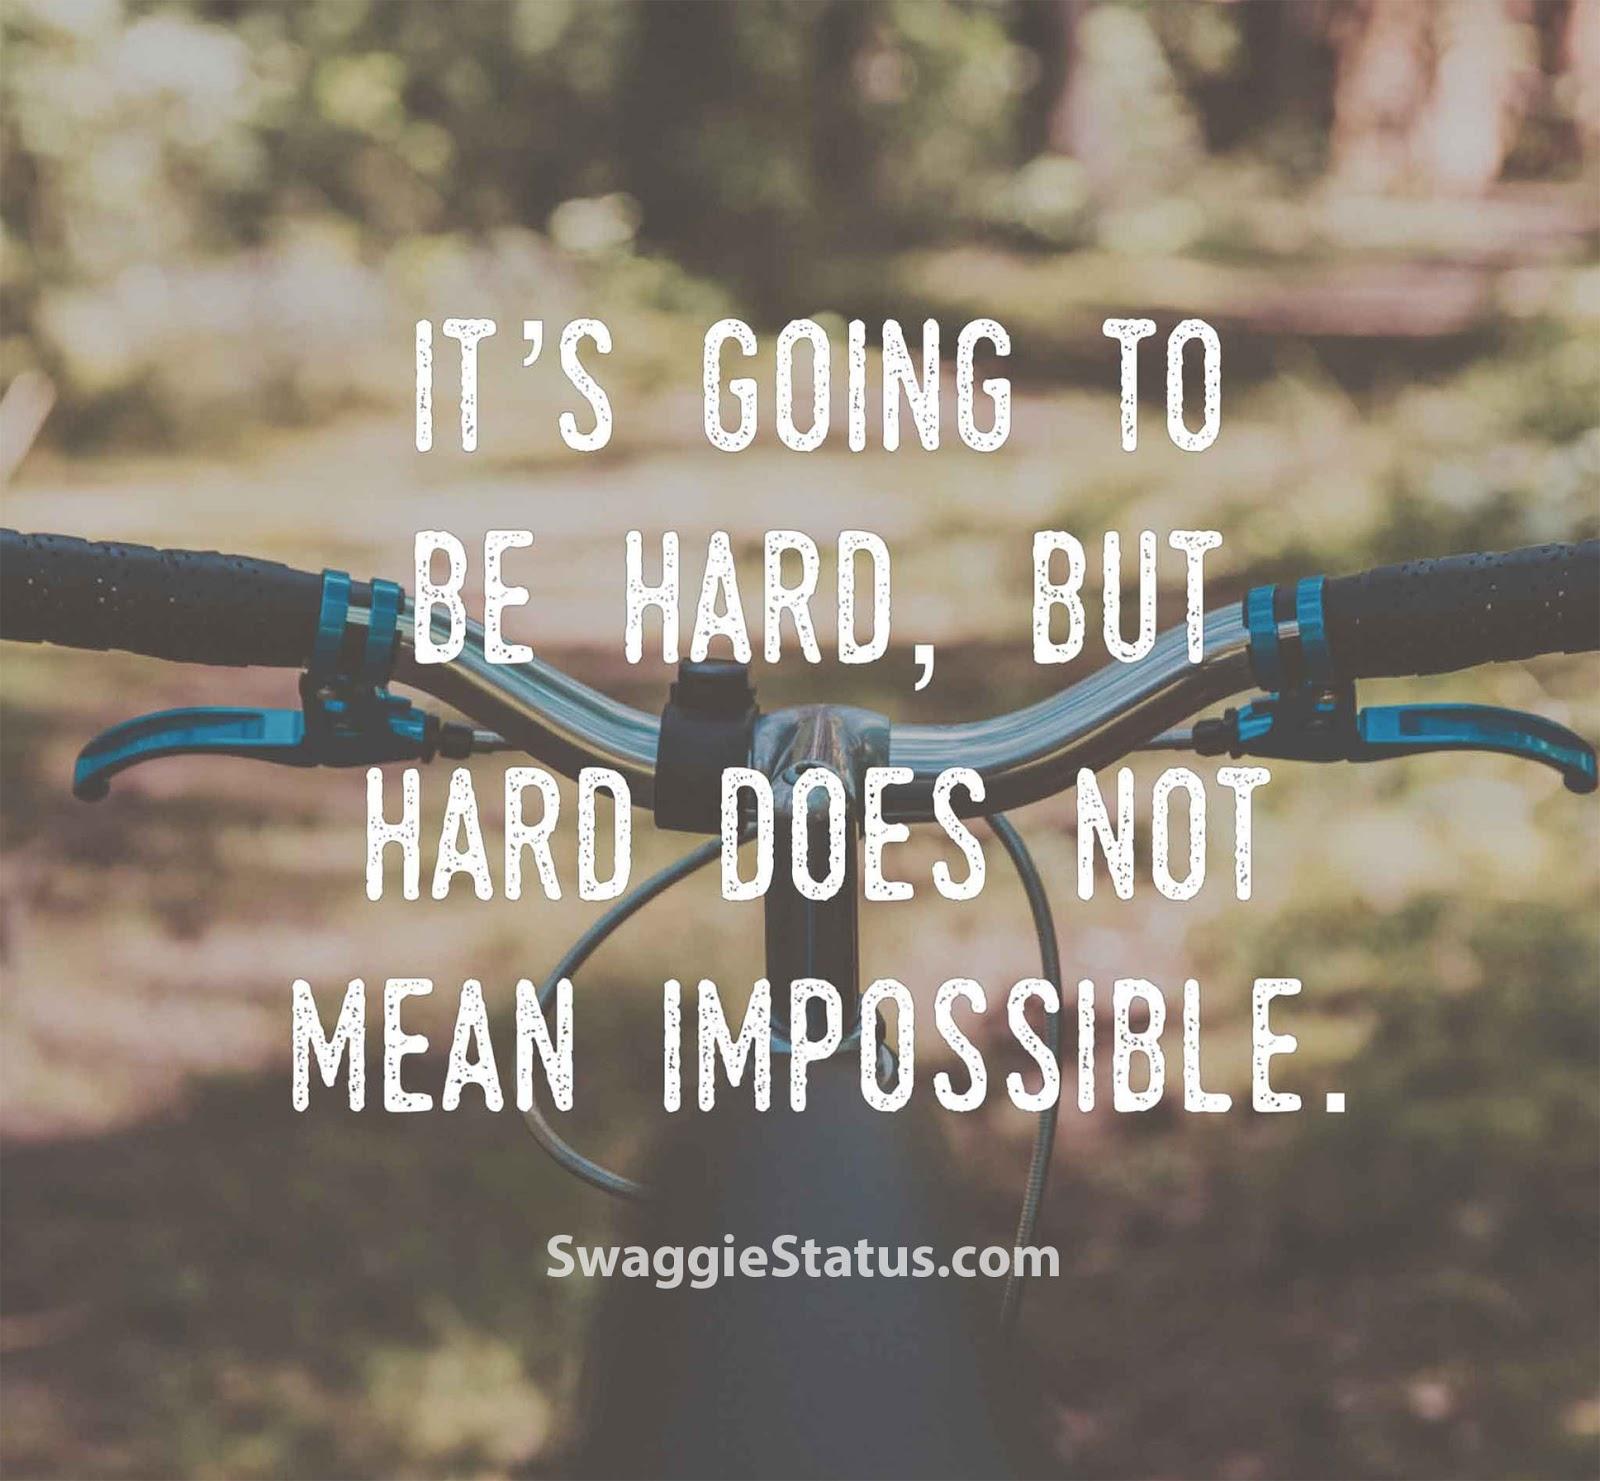 Motivational Images